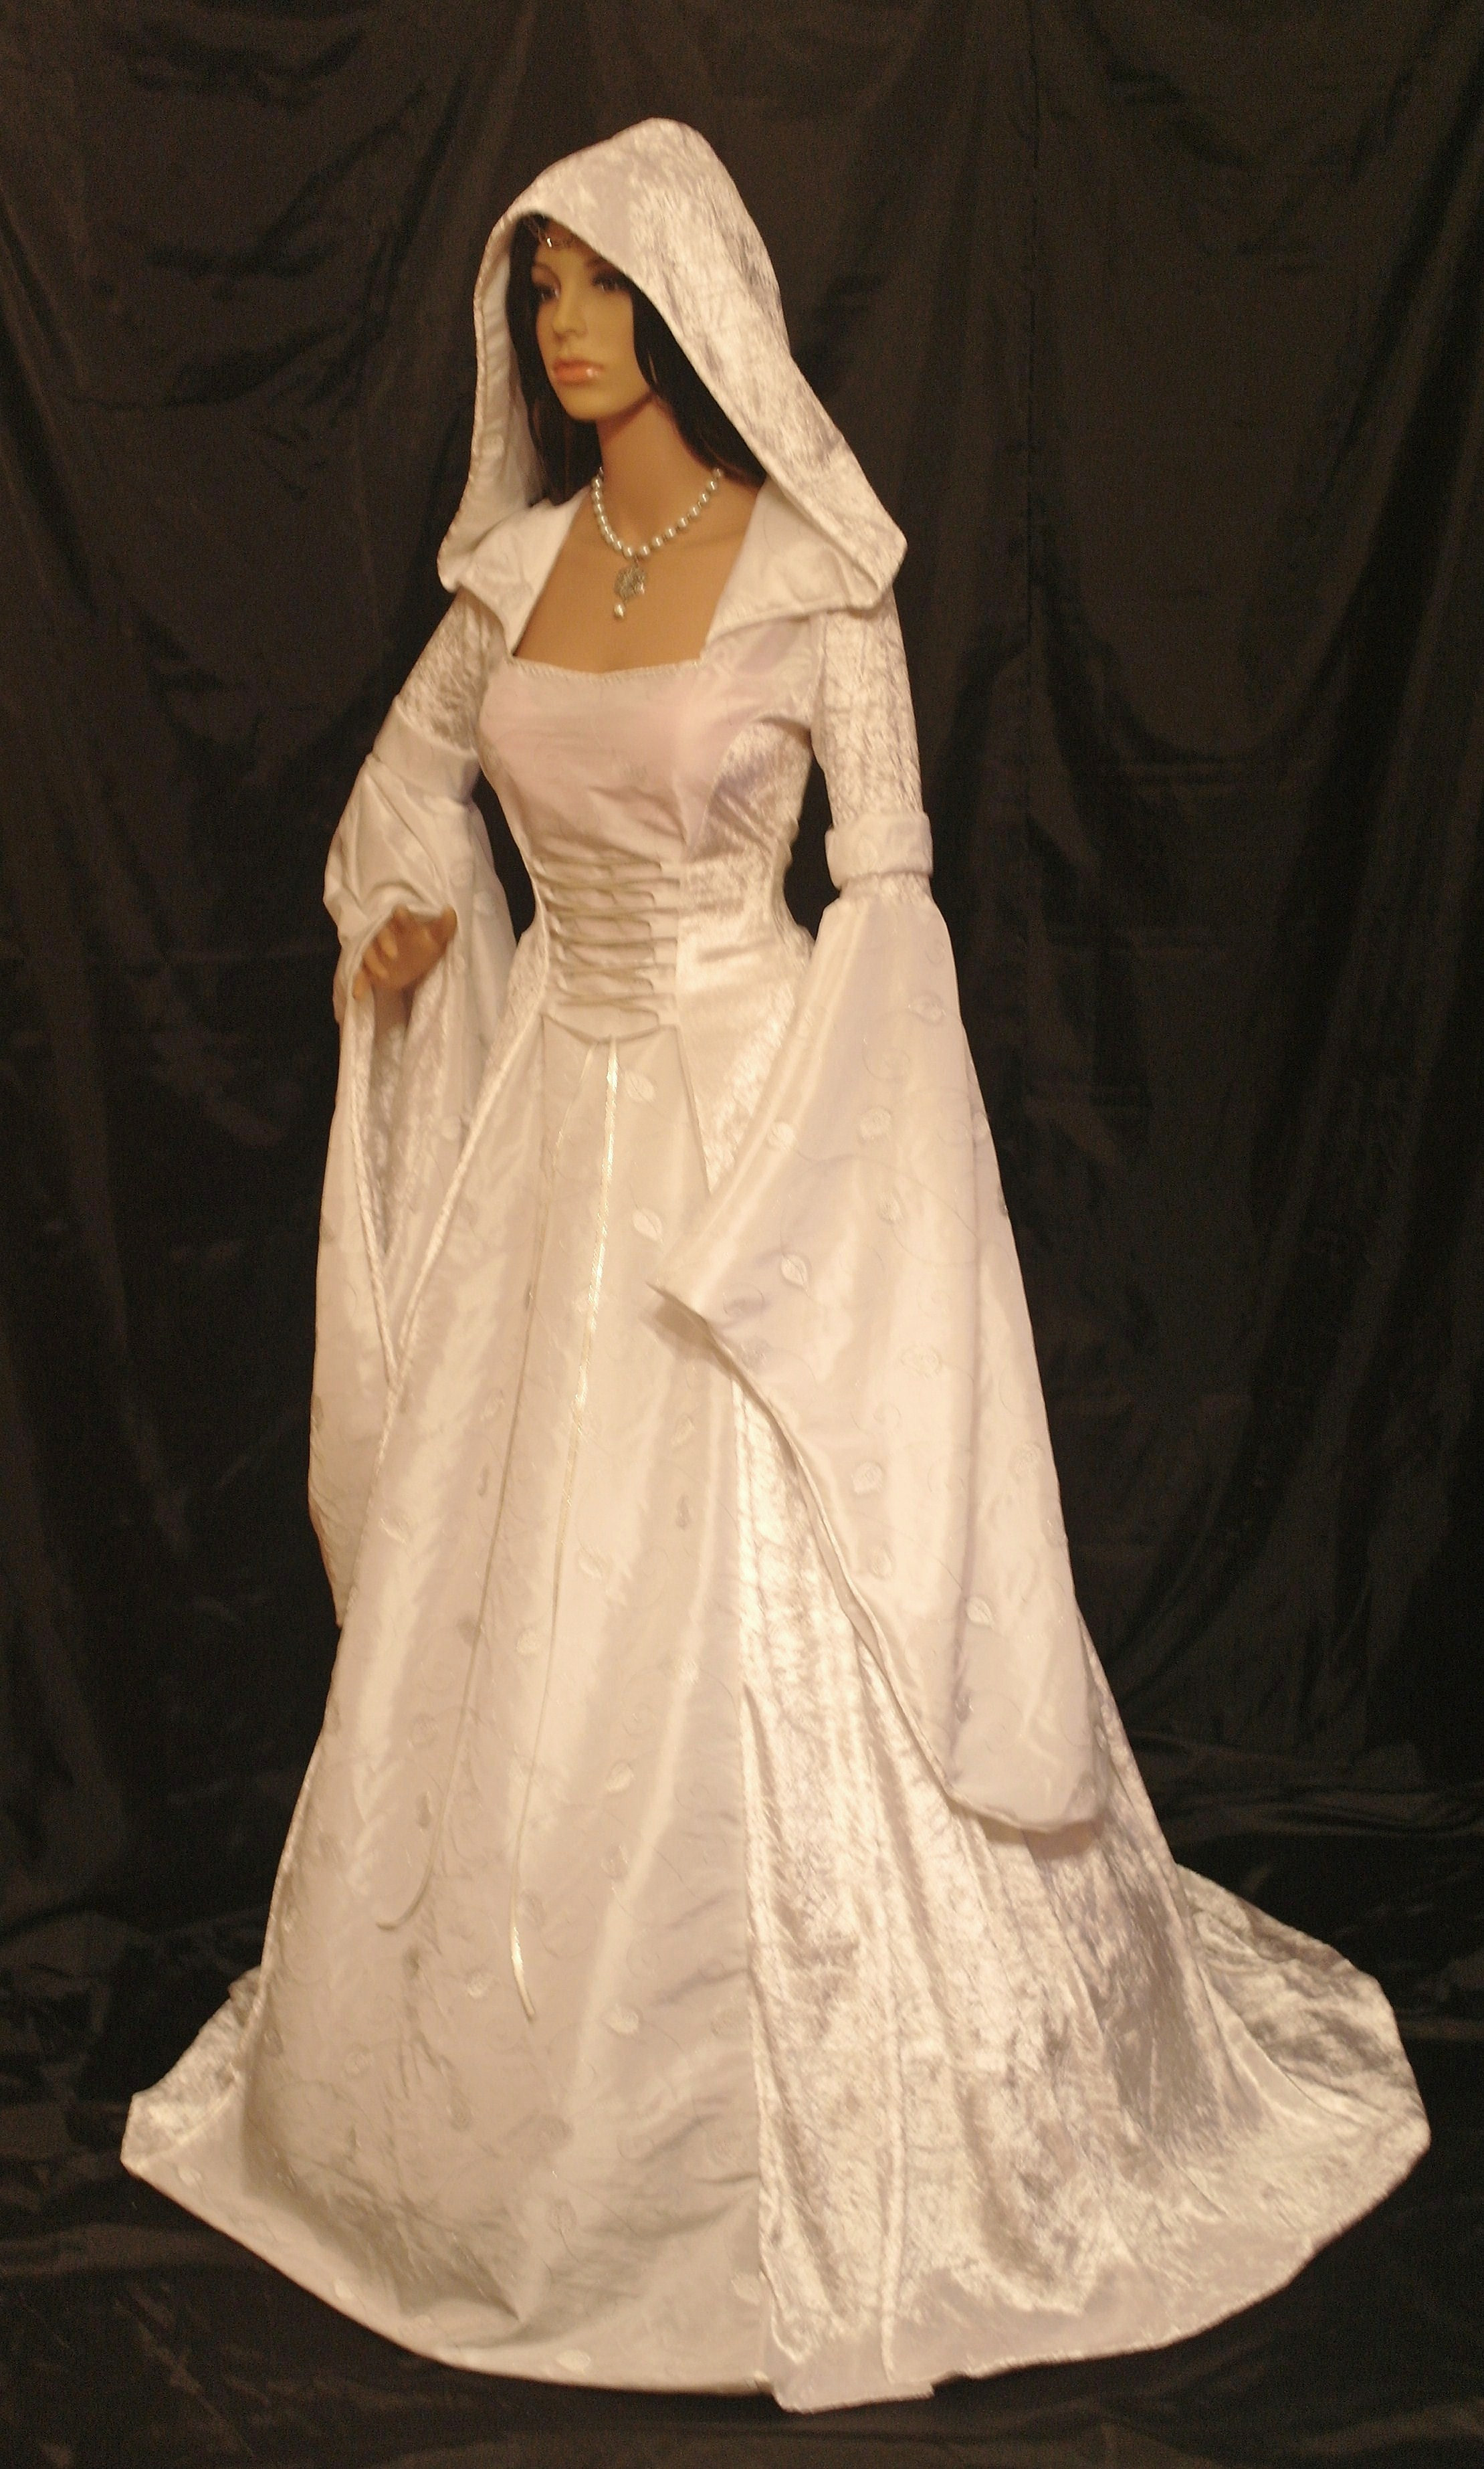 Consuelo Vanderbilt Wedding Gown - Sqqps.com